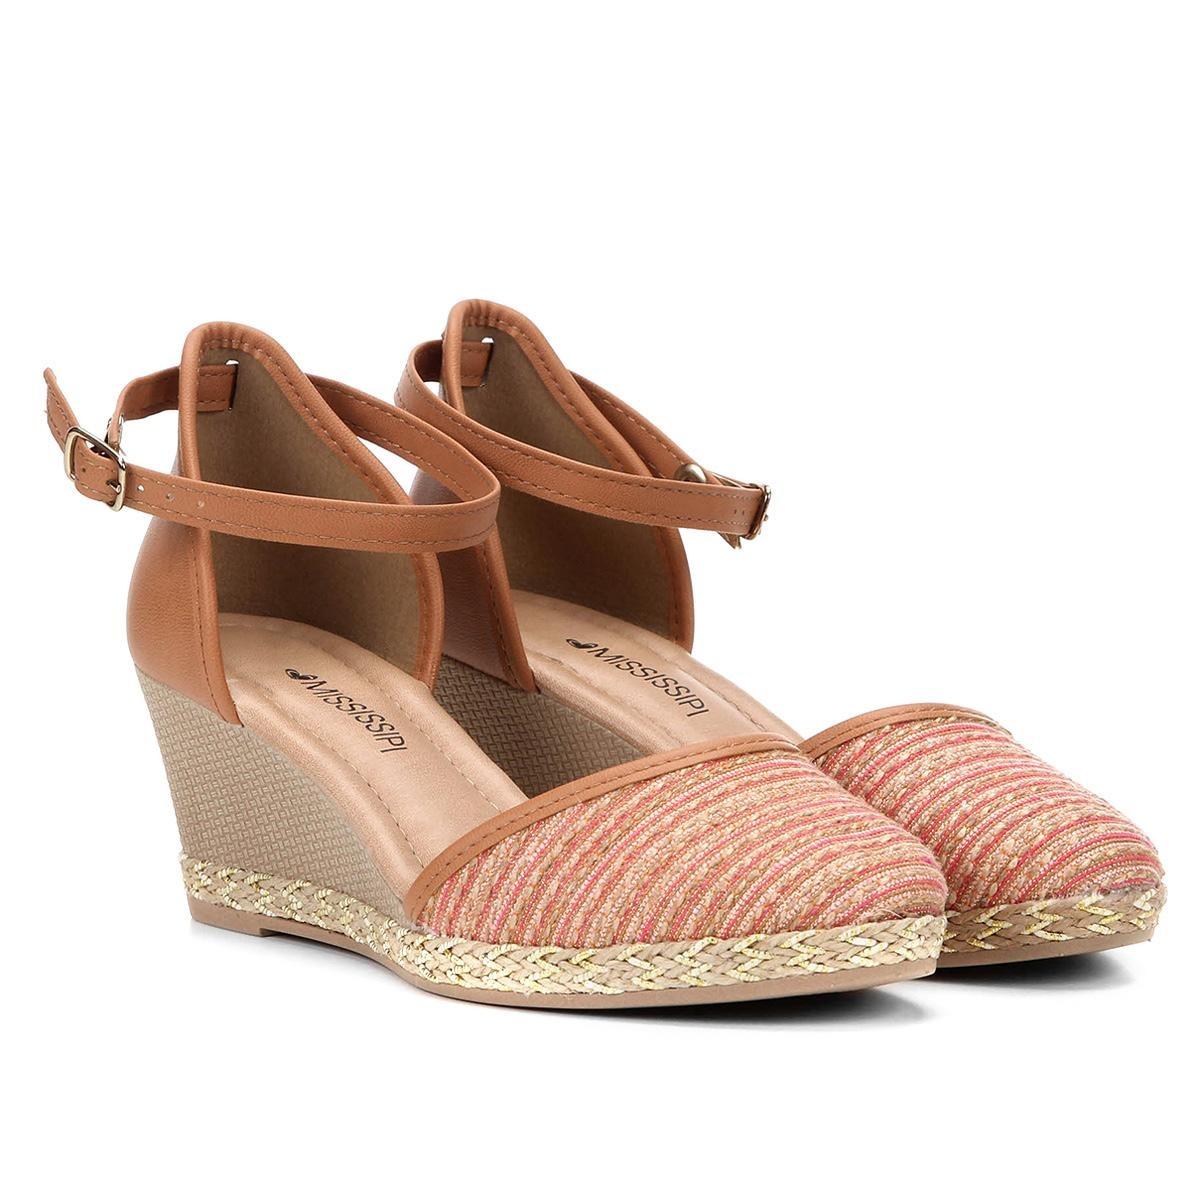 2304c3bae sandália espadrille mississipi anabela com corda feminina. Carregando zoom.